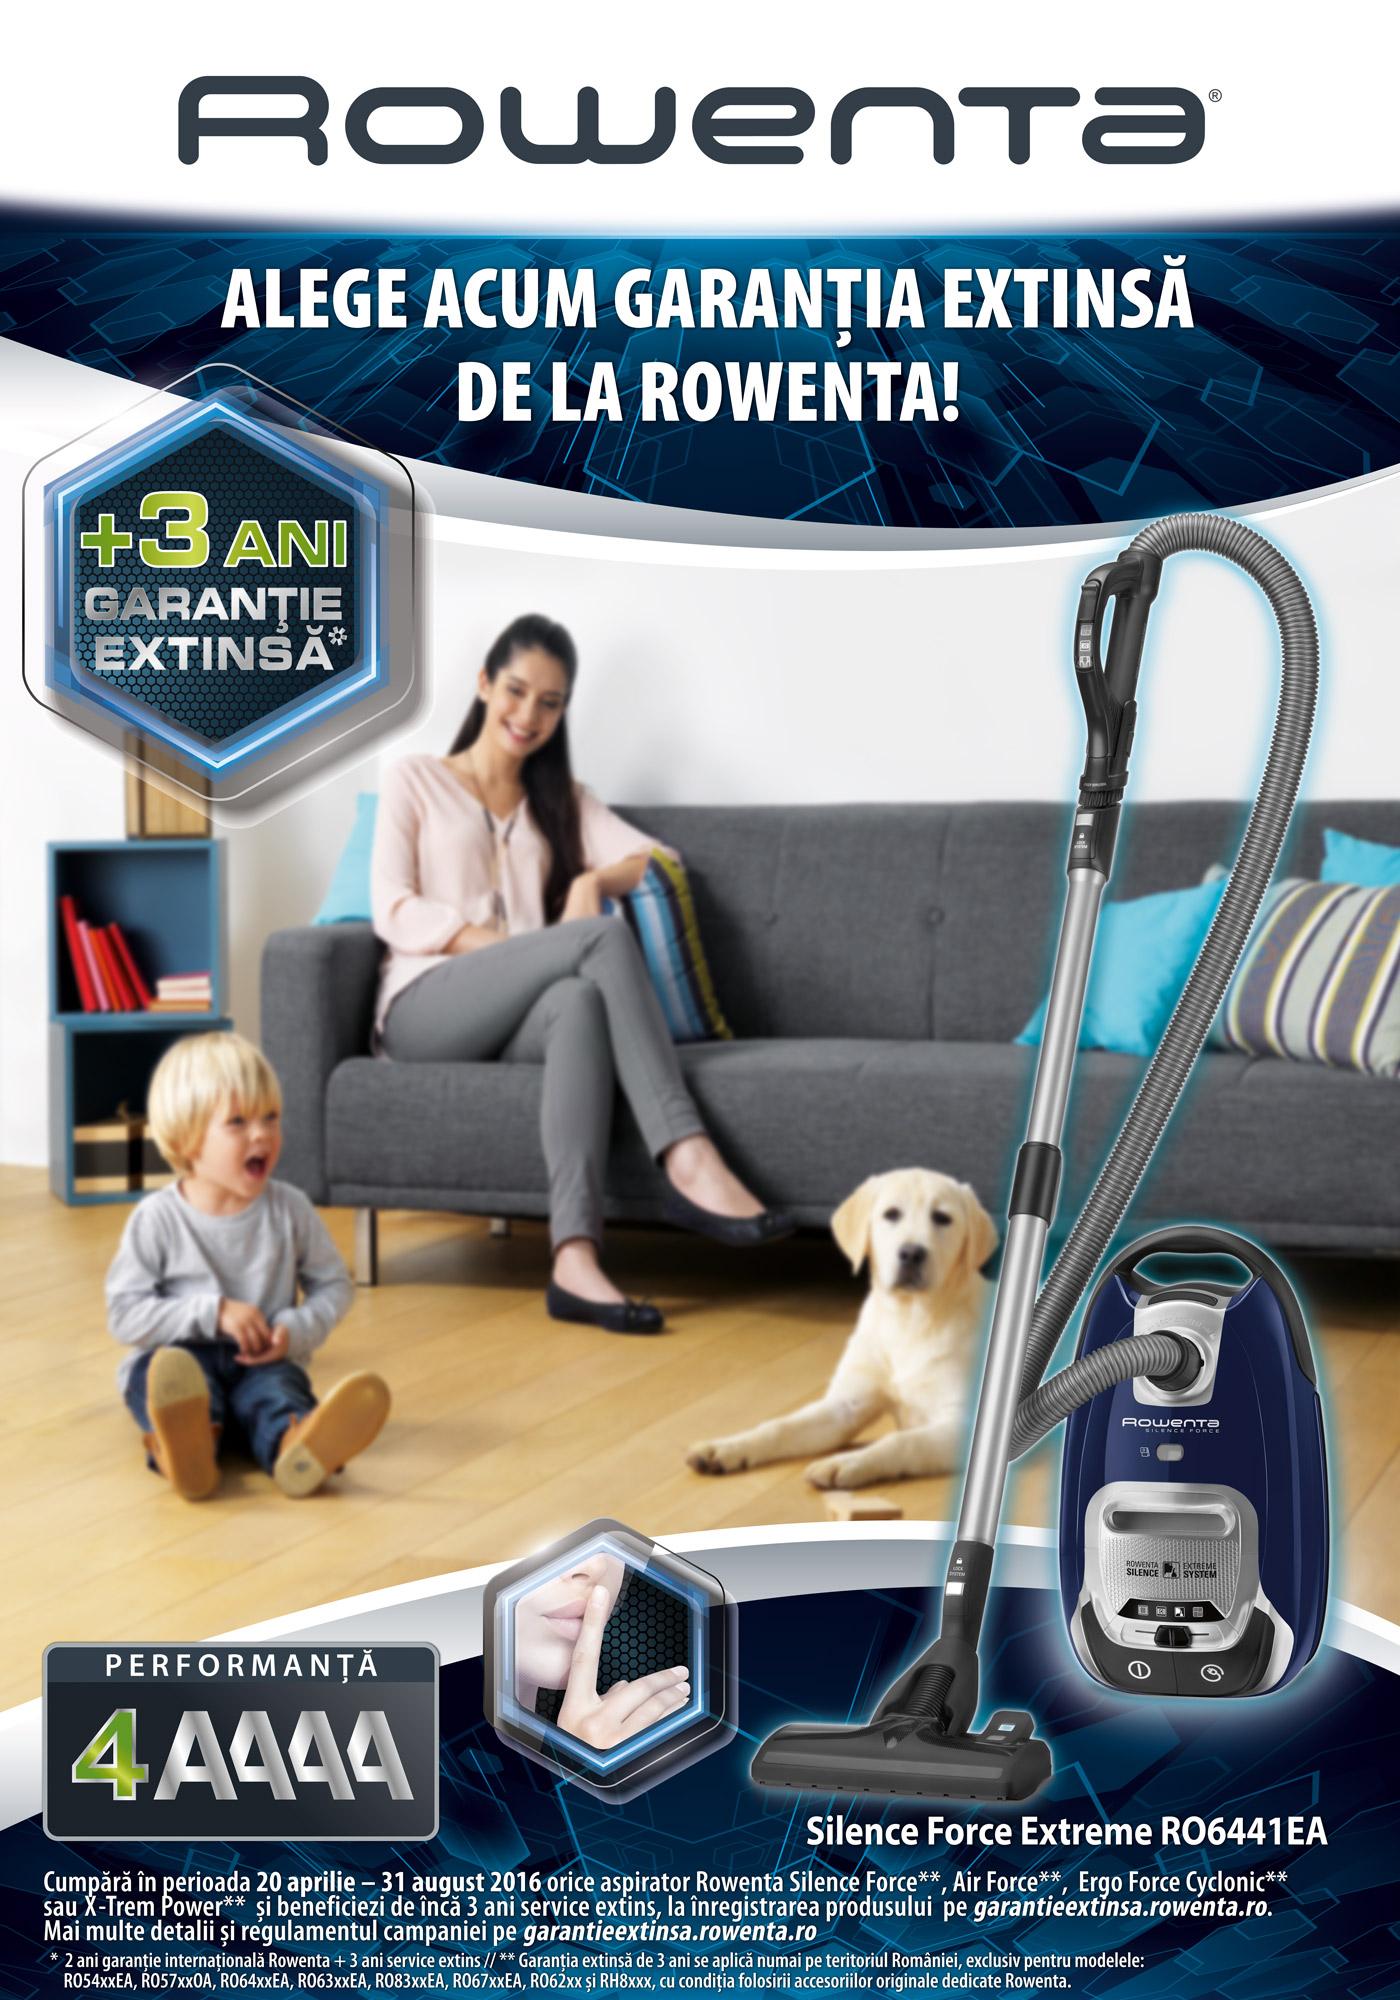 p rowenta silence force cel mai silen ios aspirator cu performan a 4a. Black Bedroom Furniture Sets. Home Design Ideas